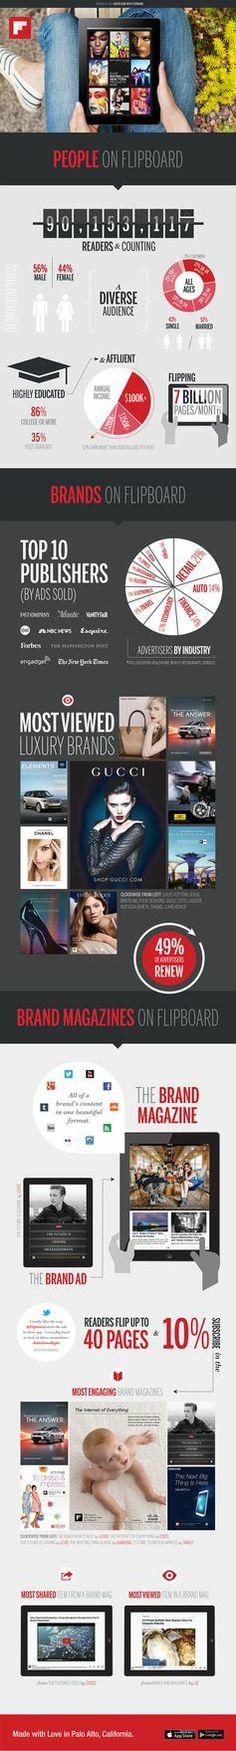 Top 10 Brands Advertising on Flipboard